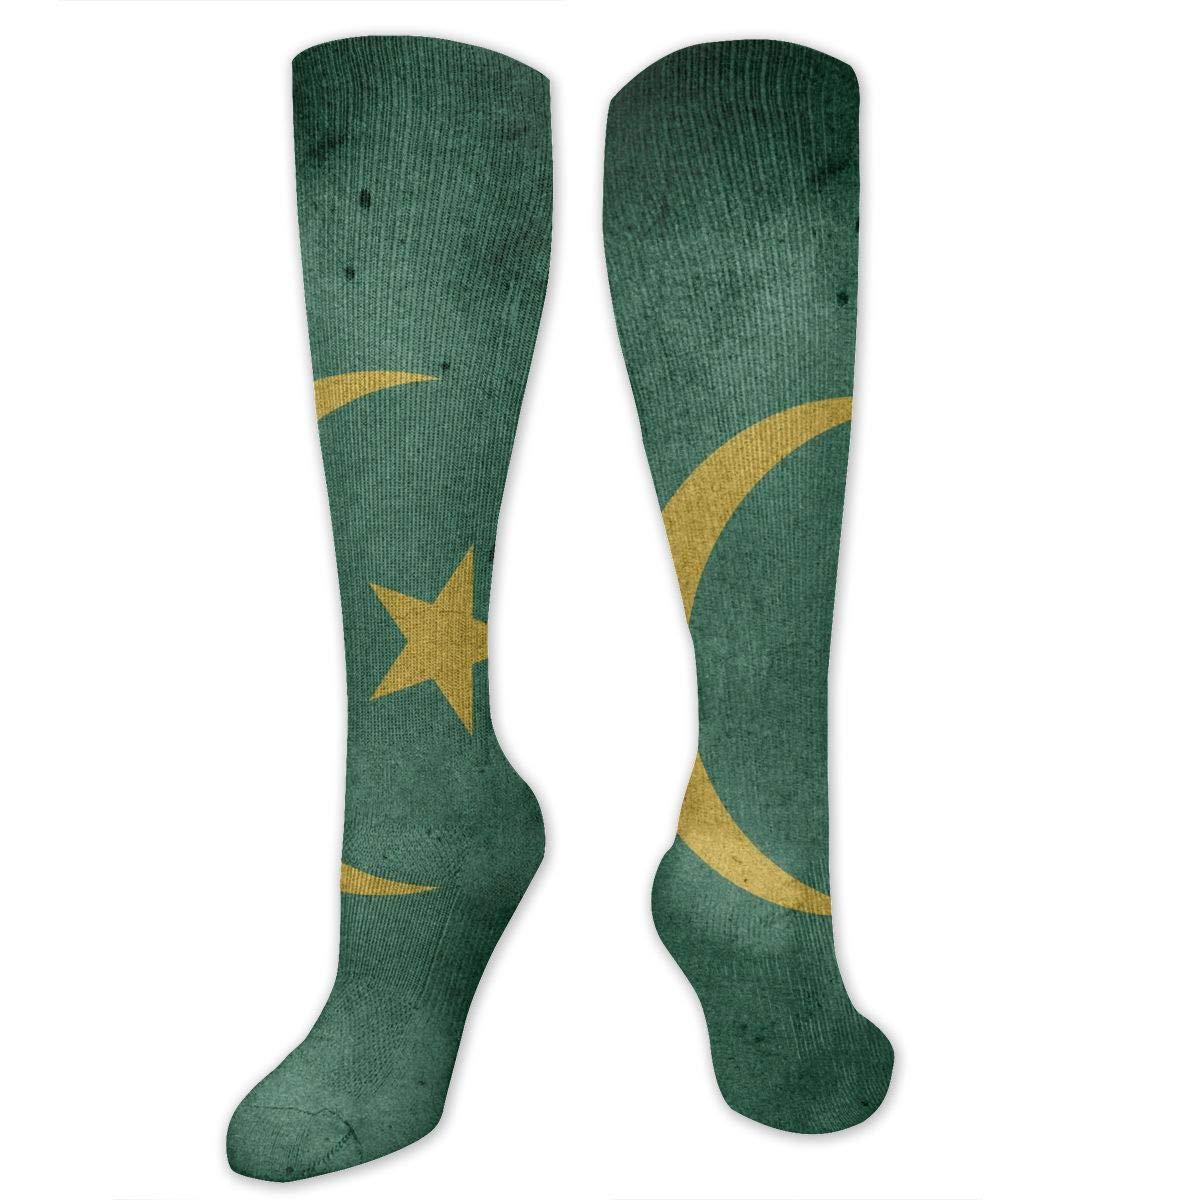 Chanwazibibiliu Mauritania Flag Mens Colorful Dress Socks Funky Men Multicolored Pattern Fashionable Fun Crew Cotton Socks